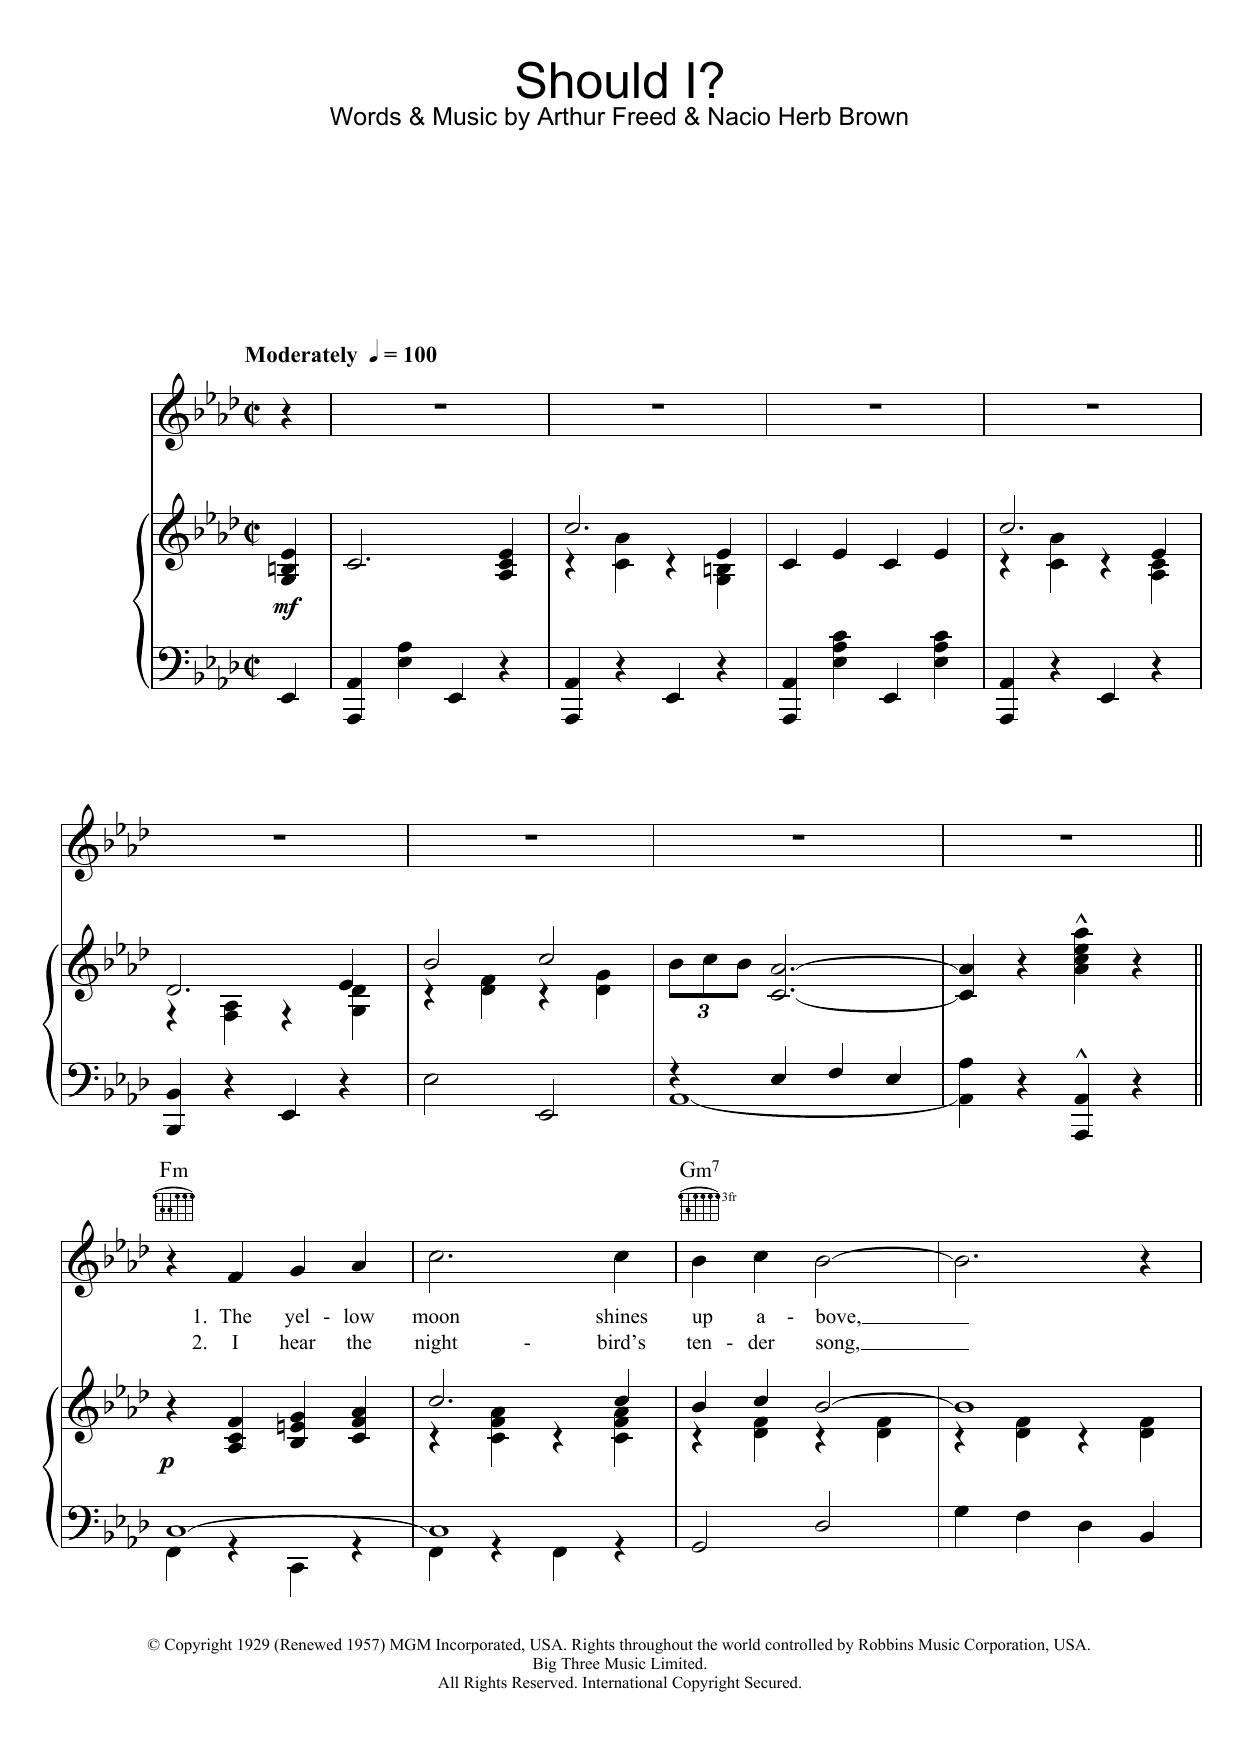 Frank Sinatra - Should I